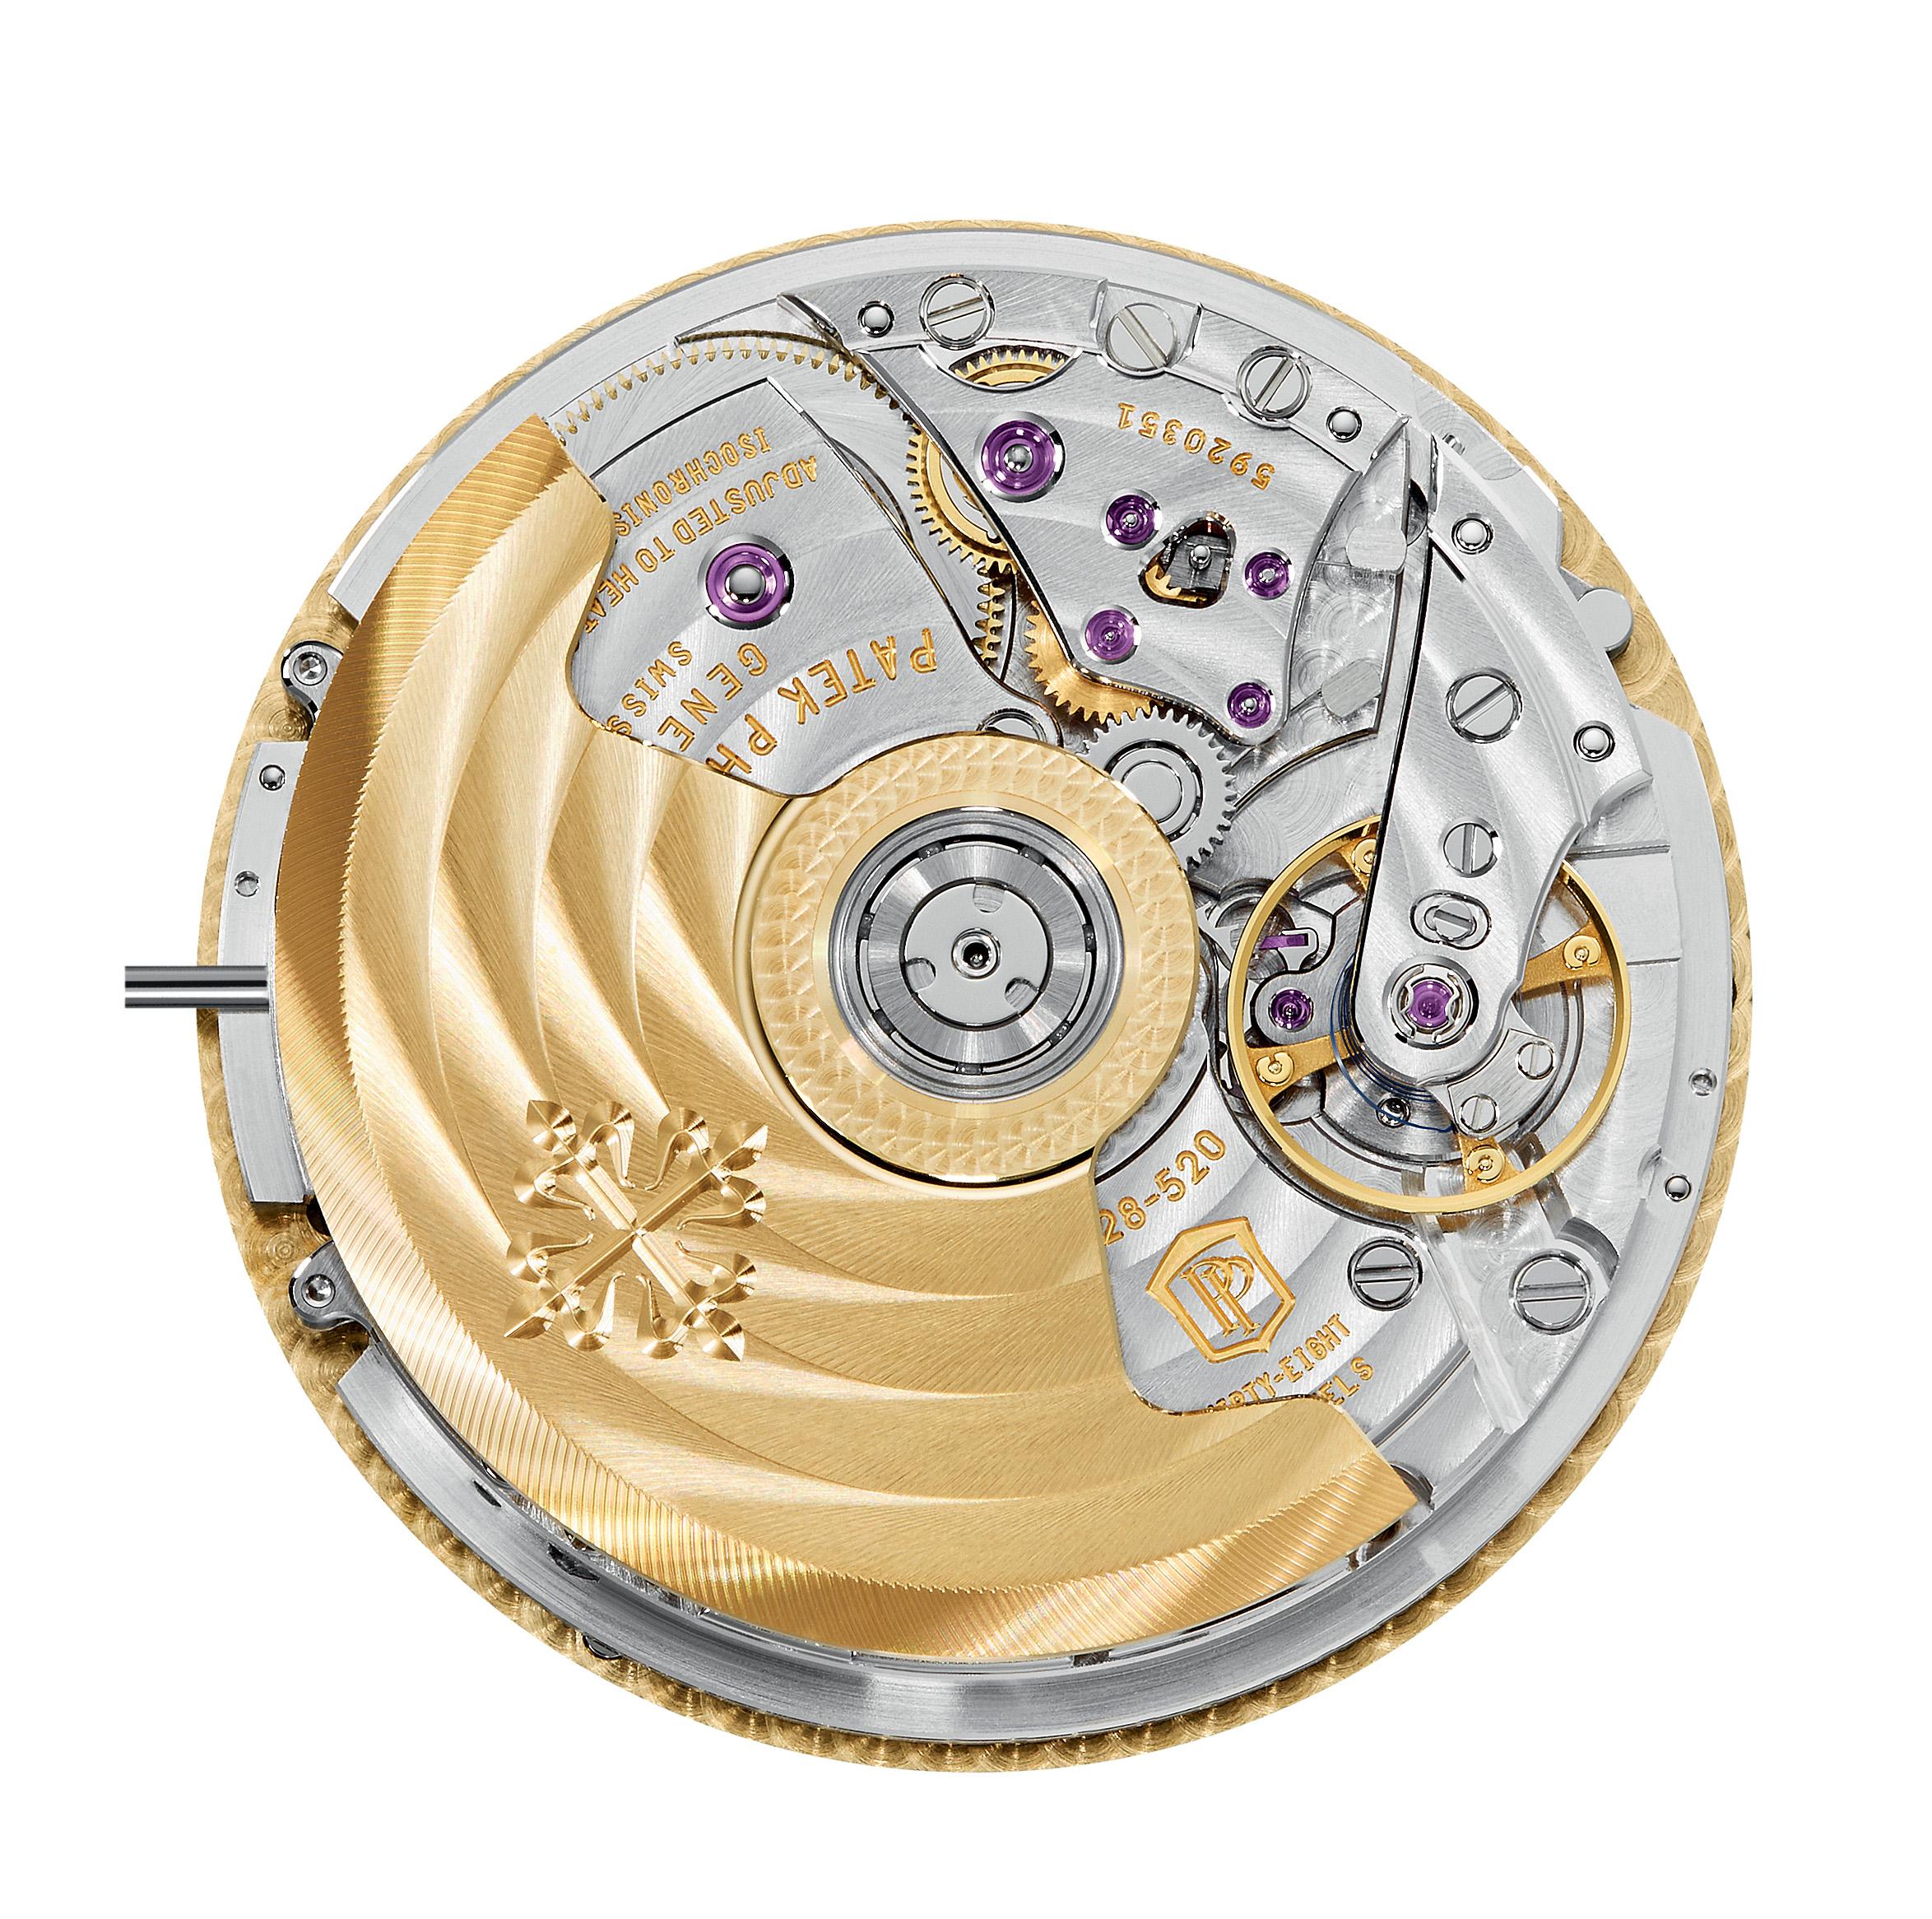 Patek Philippe Chronograph World Time Ref. 5930G_Images_5930G_001_JPEG RVB_CH_28_520_524_PP_VERSO_RVB